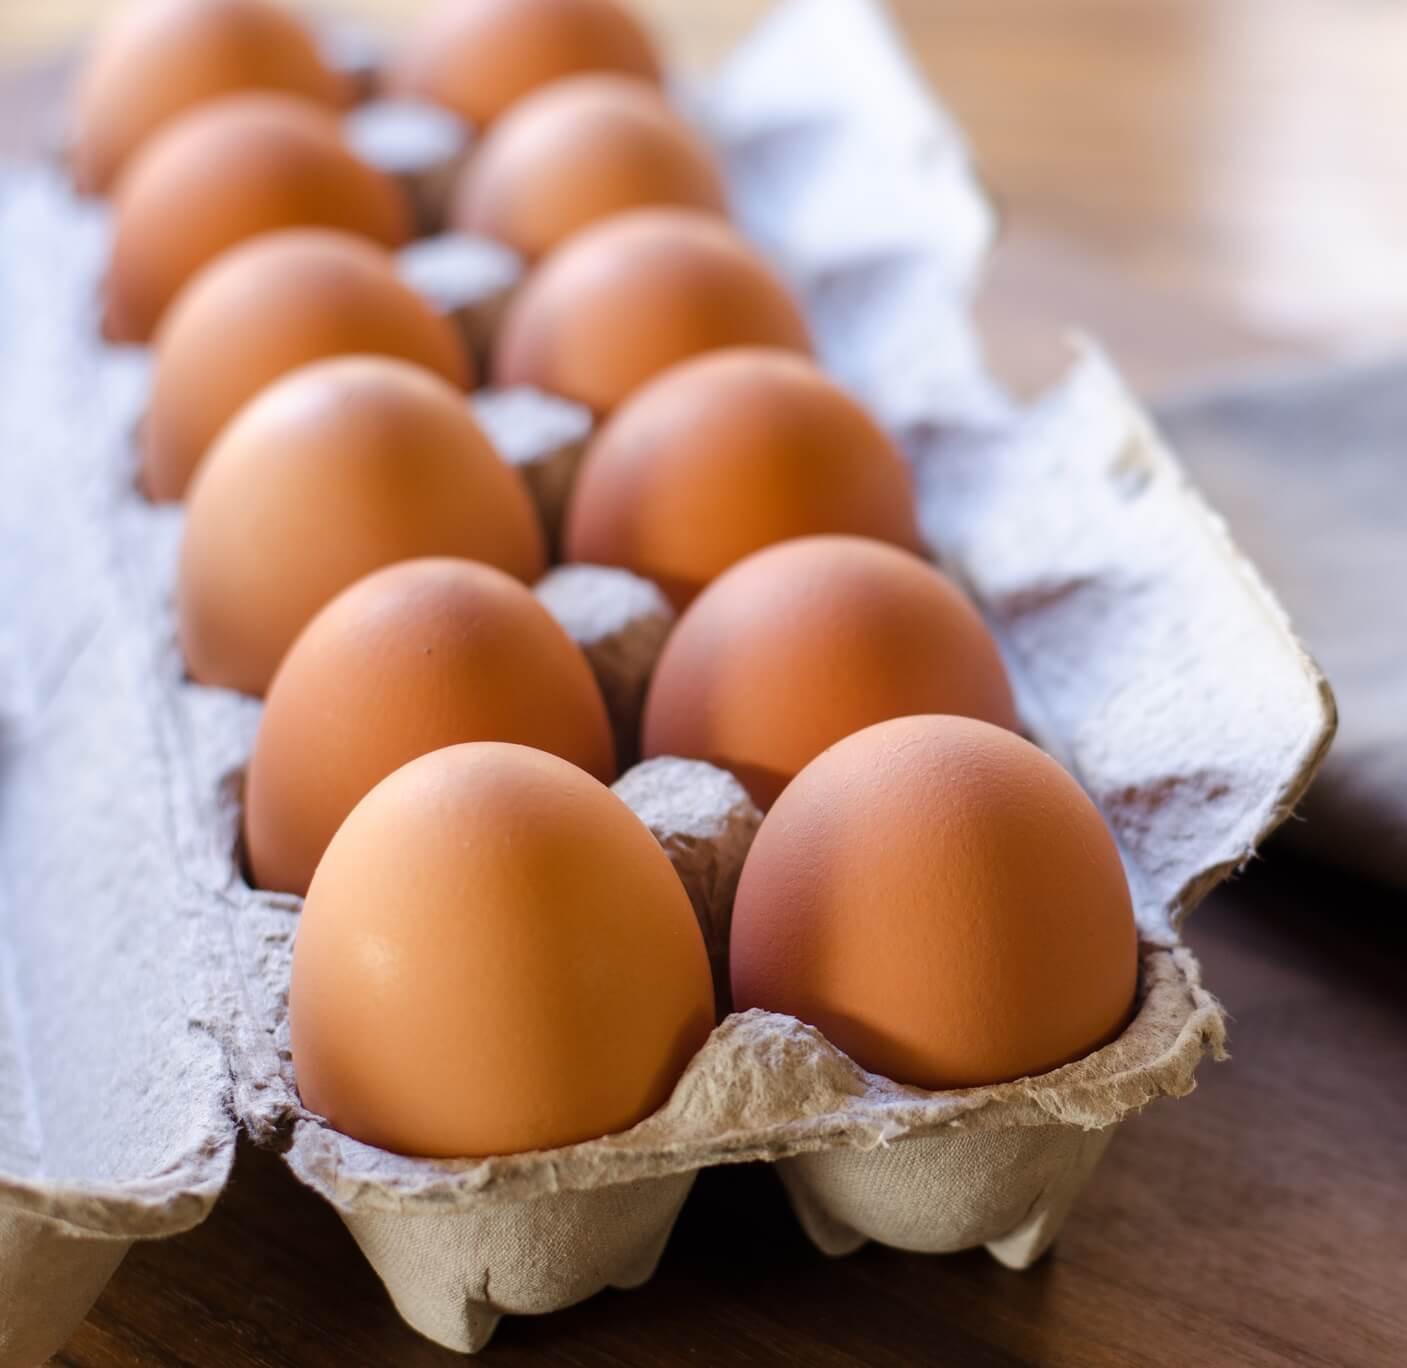 Free Range Eggs (1 Dozen)